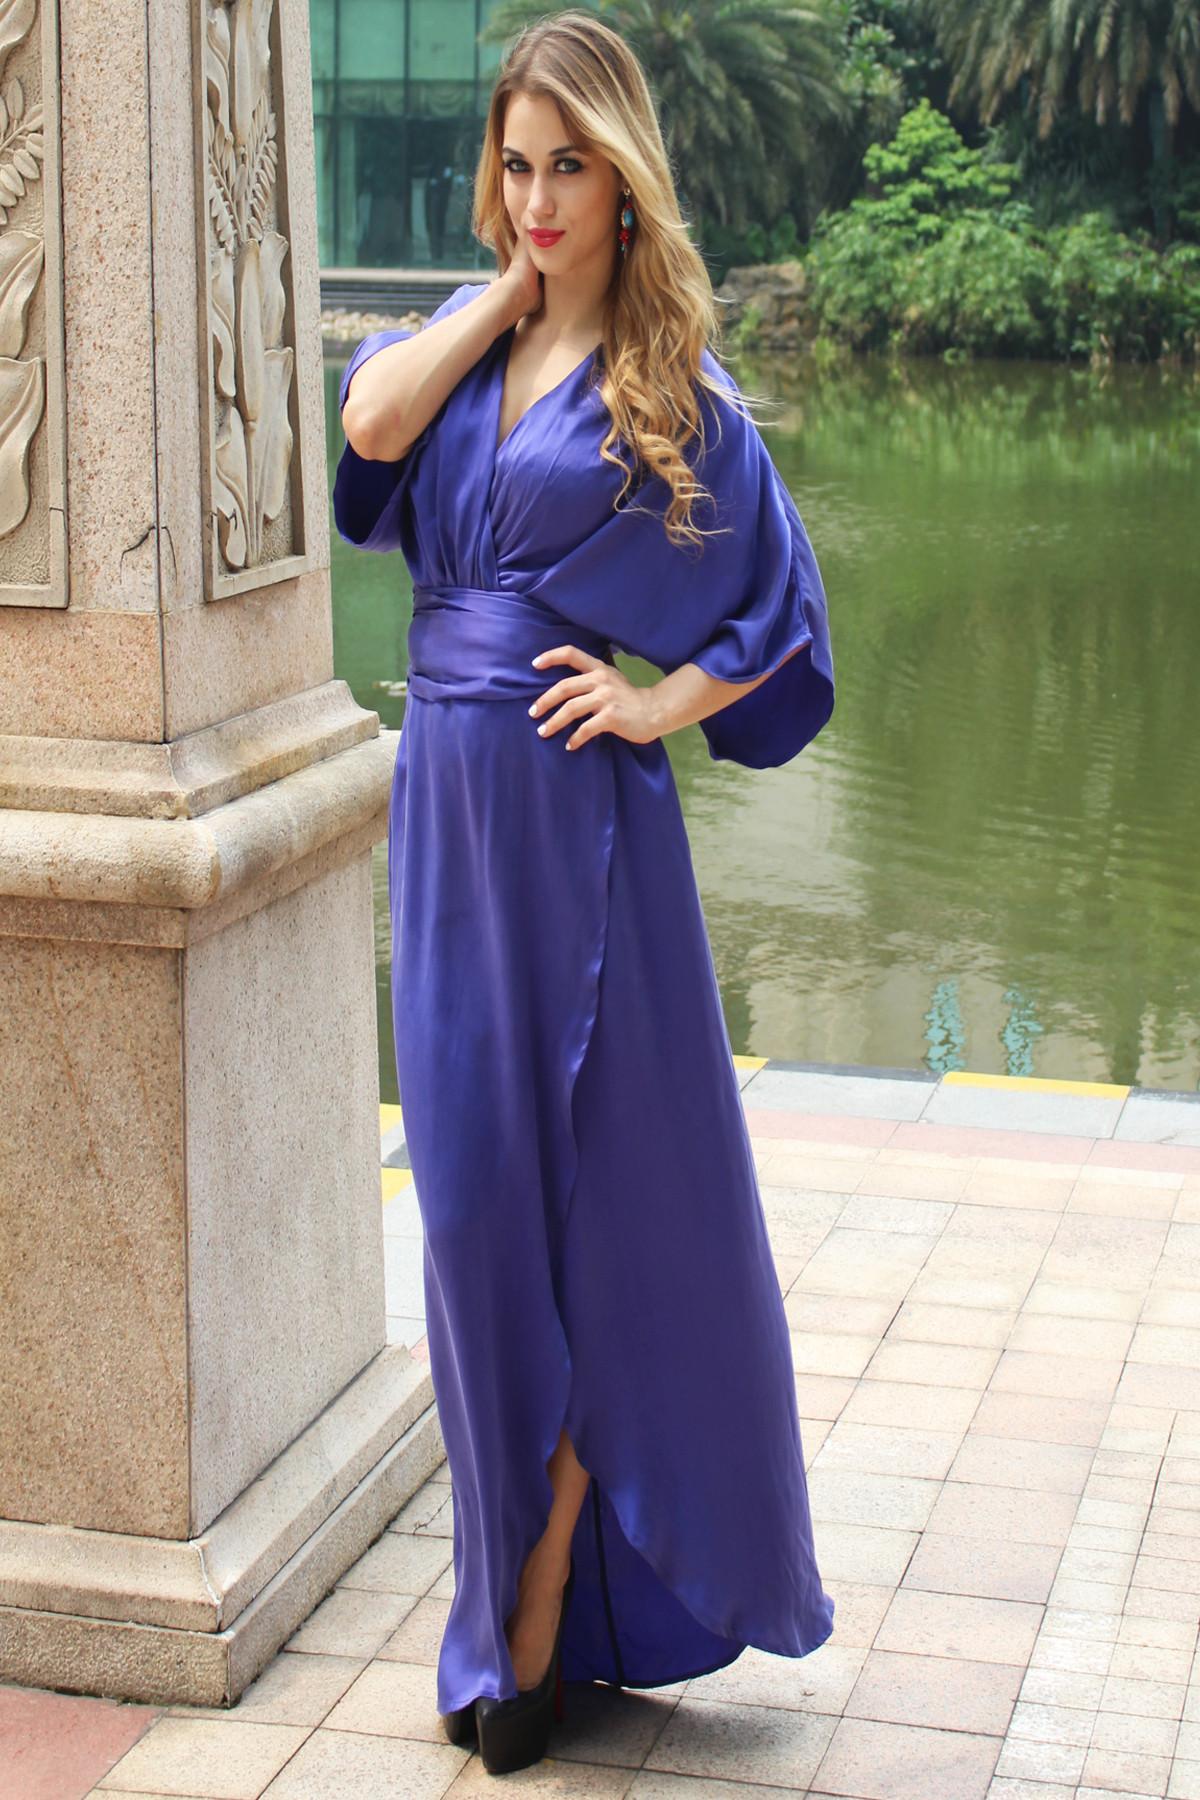 Blue Silk Dress - Blue Flowy Dress